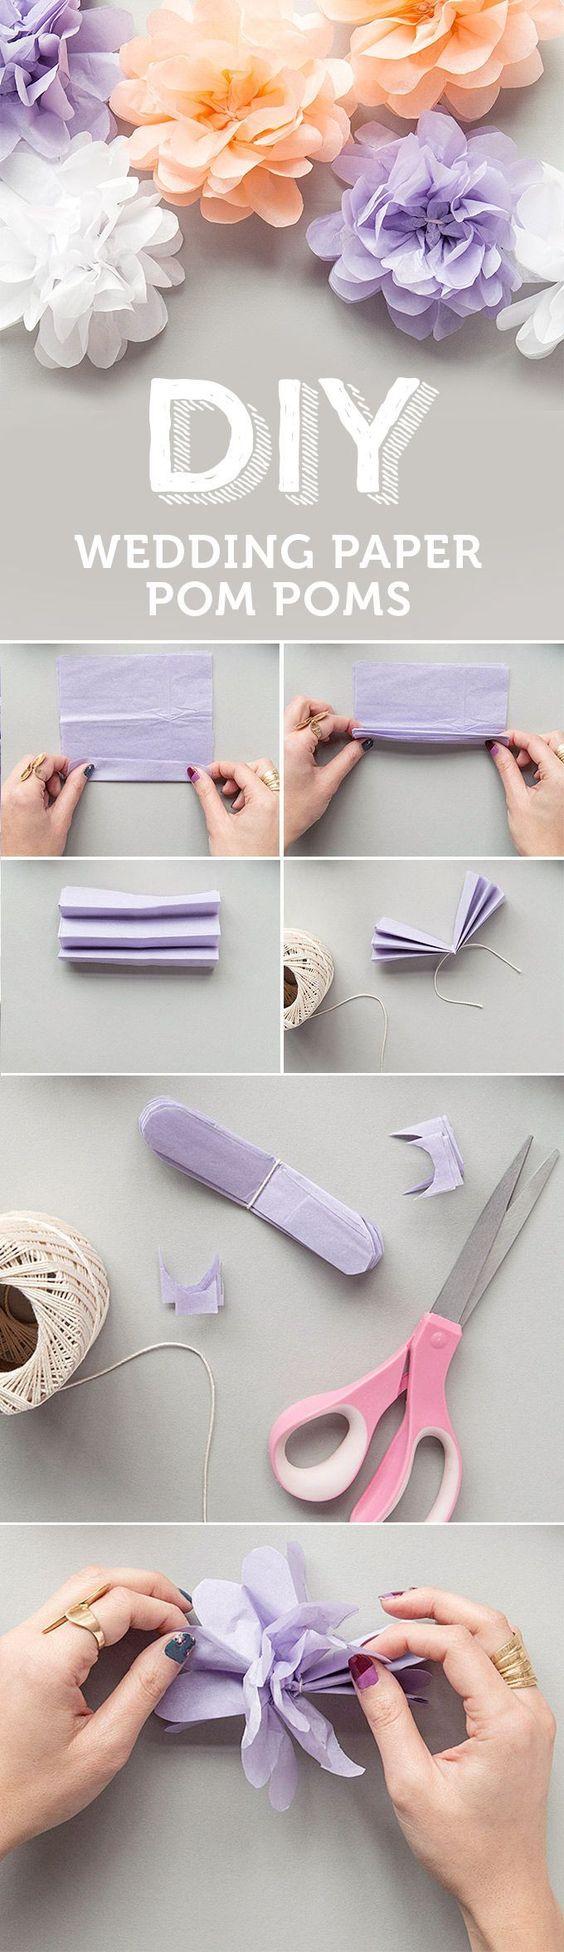 Wedding decorations, DIY decorations, DIY wedding, paper crafts, party crafts, evermine.com, evermine (Diy Crafts)